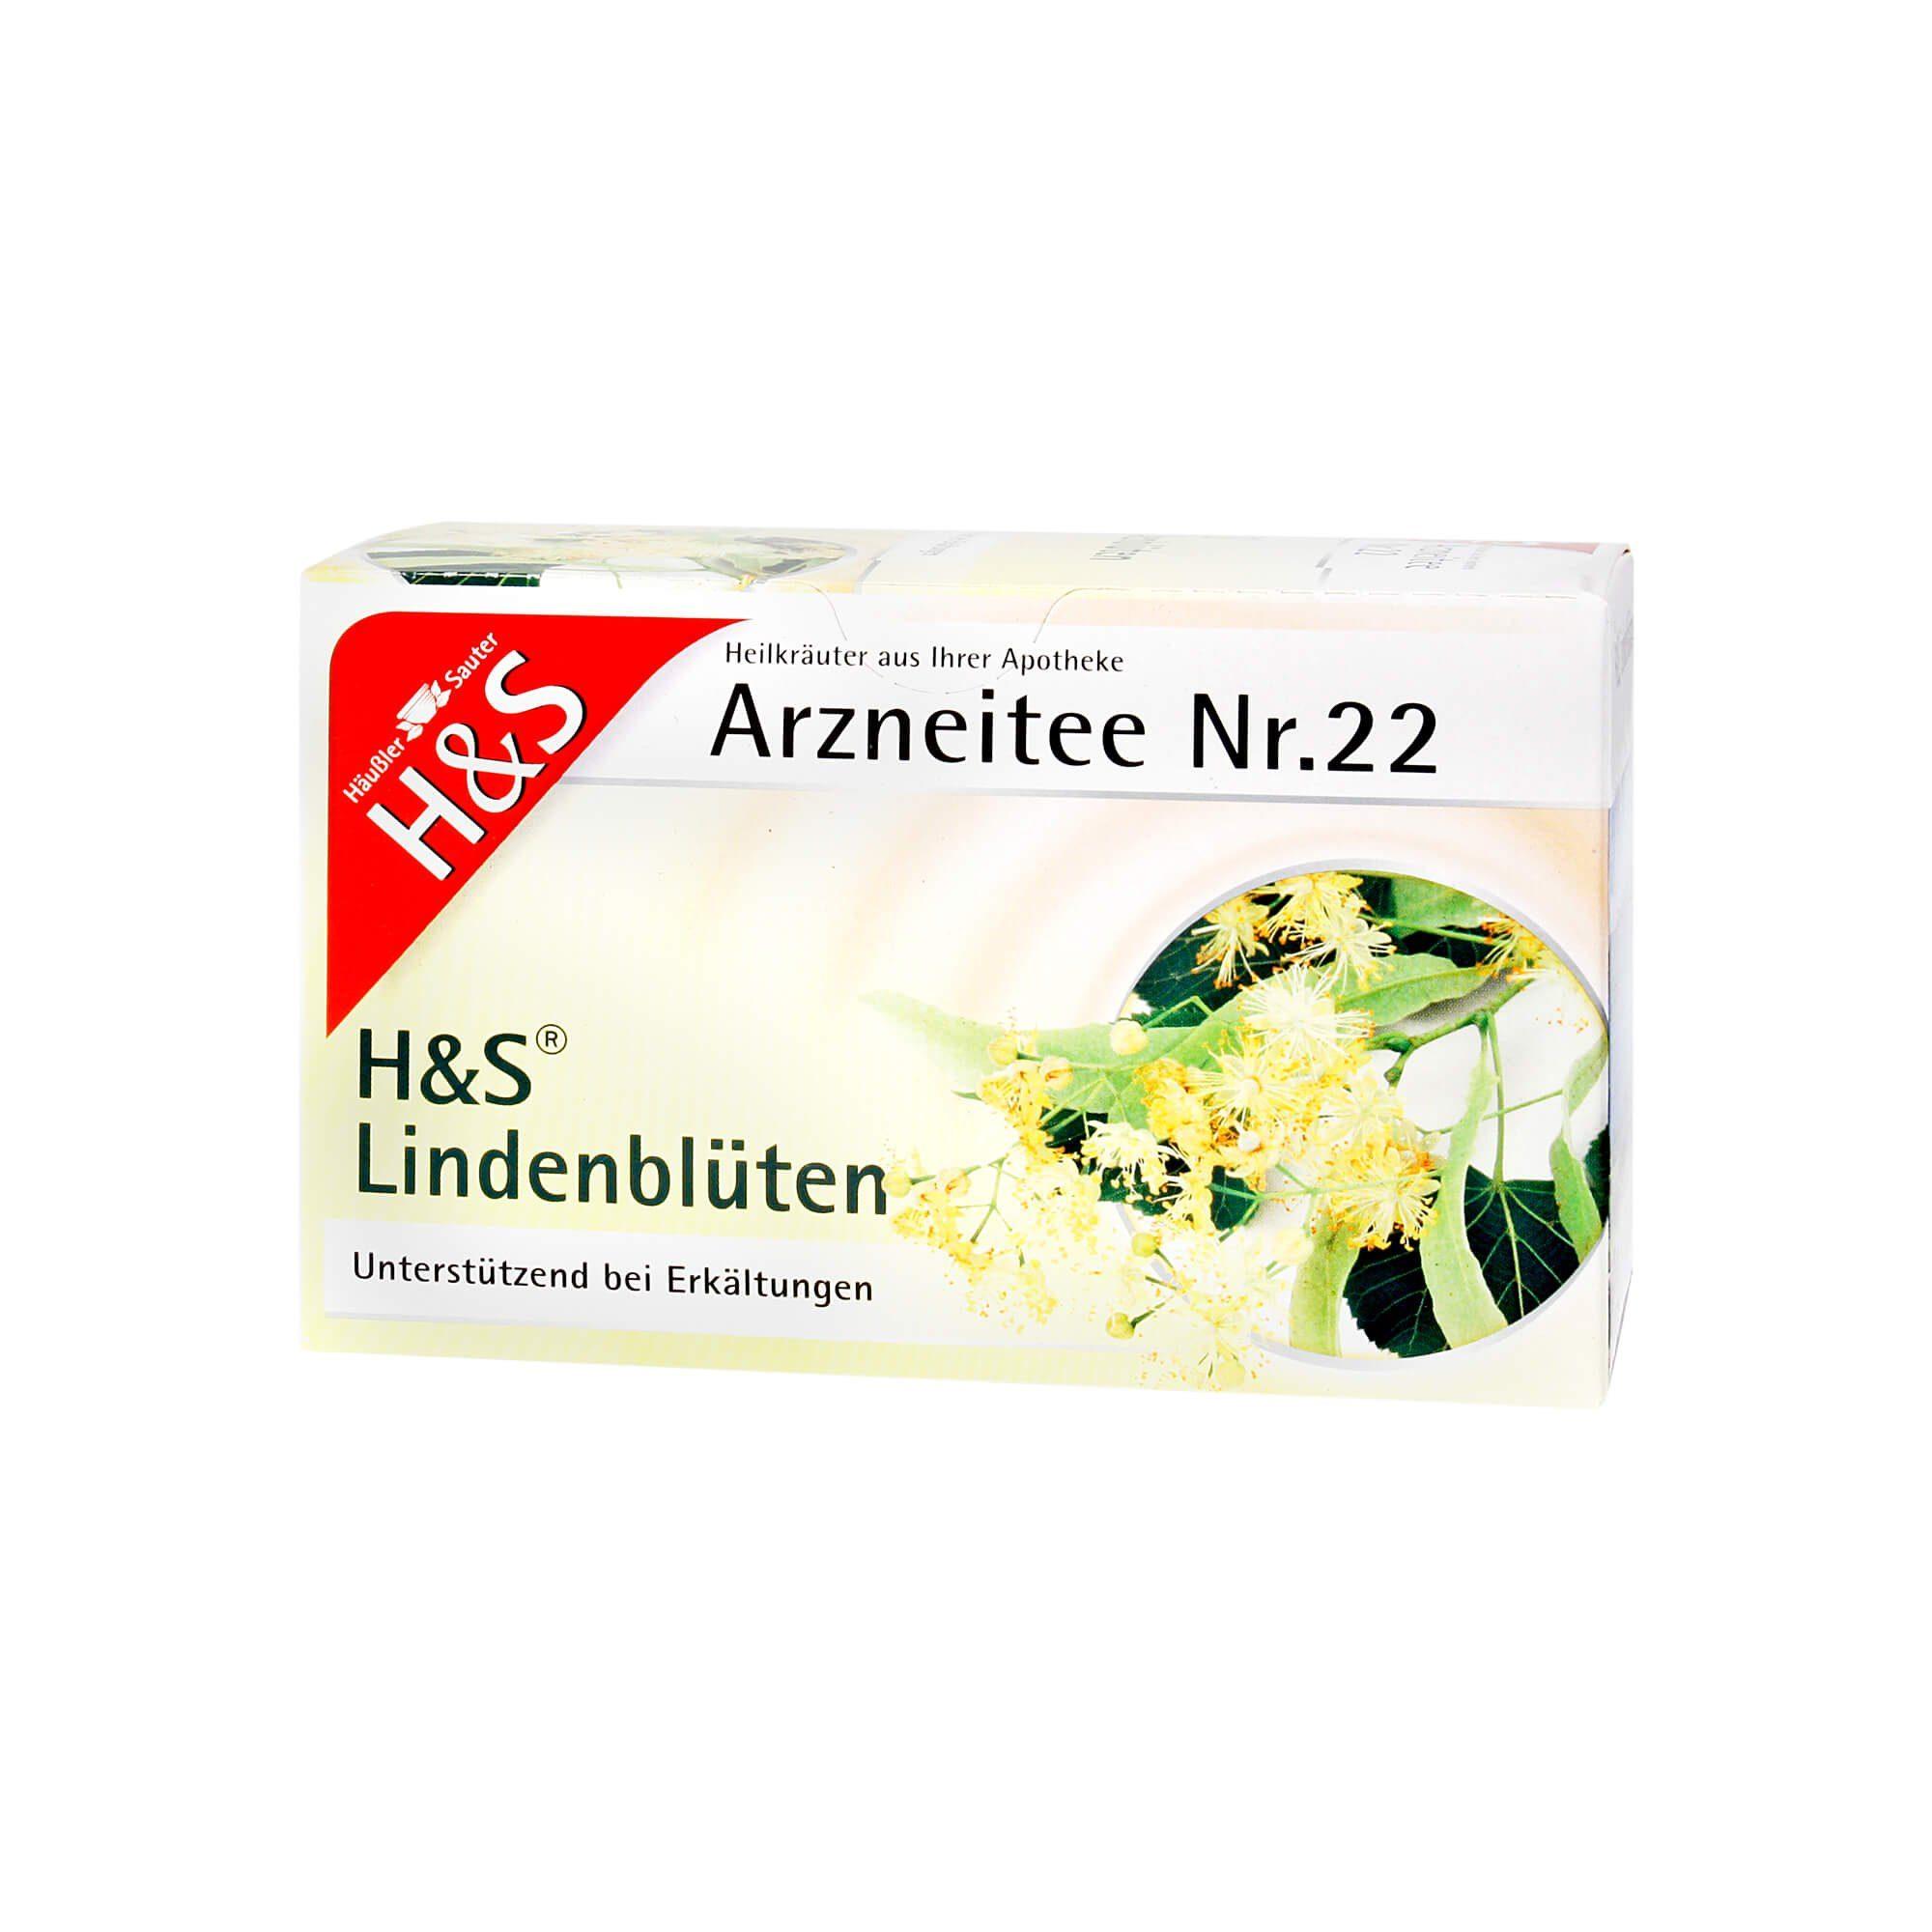 H&S Lindenblüten, 20 St